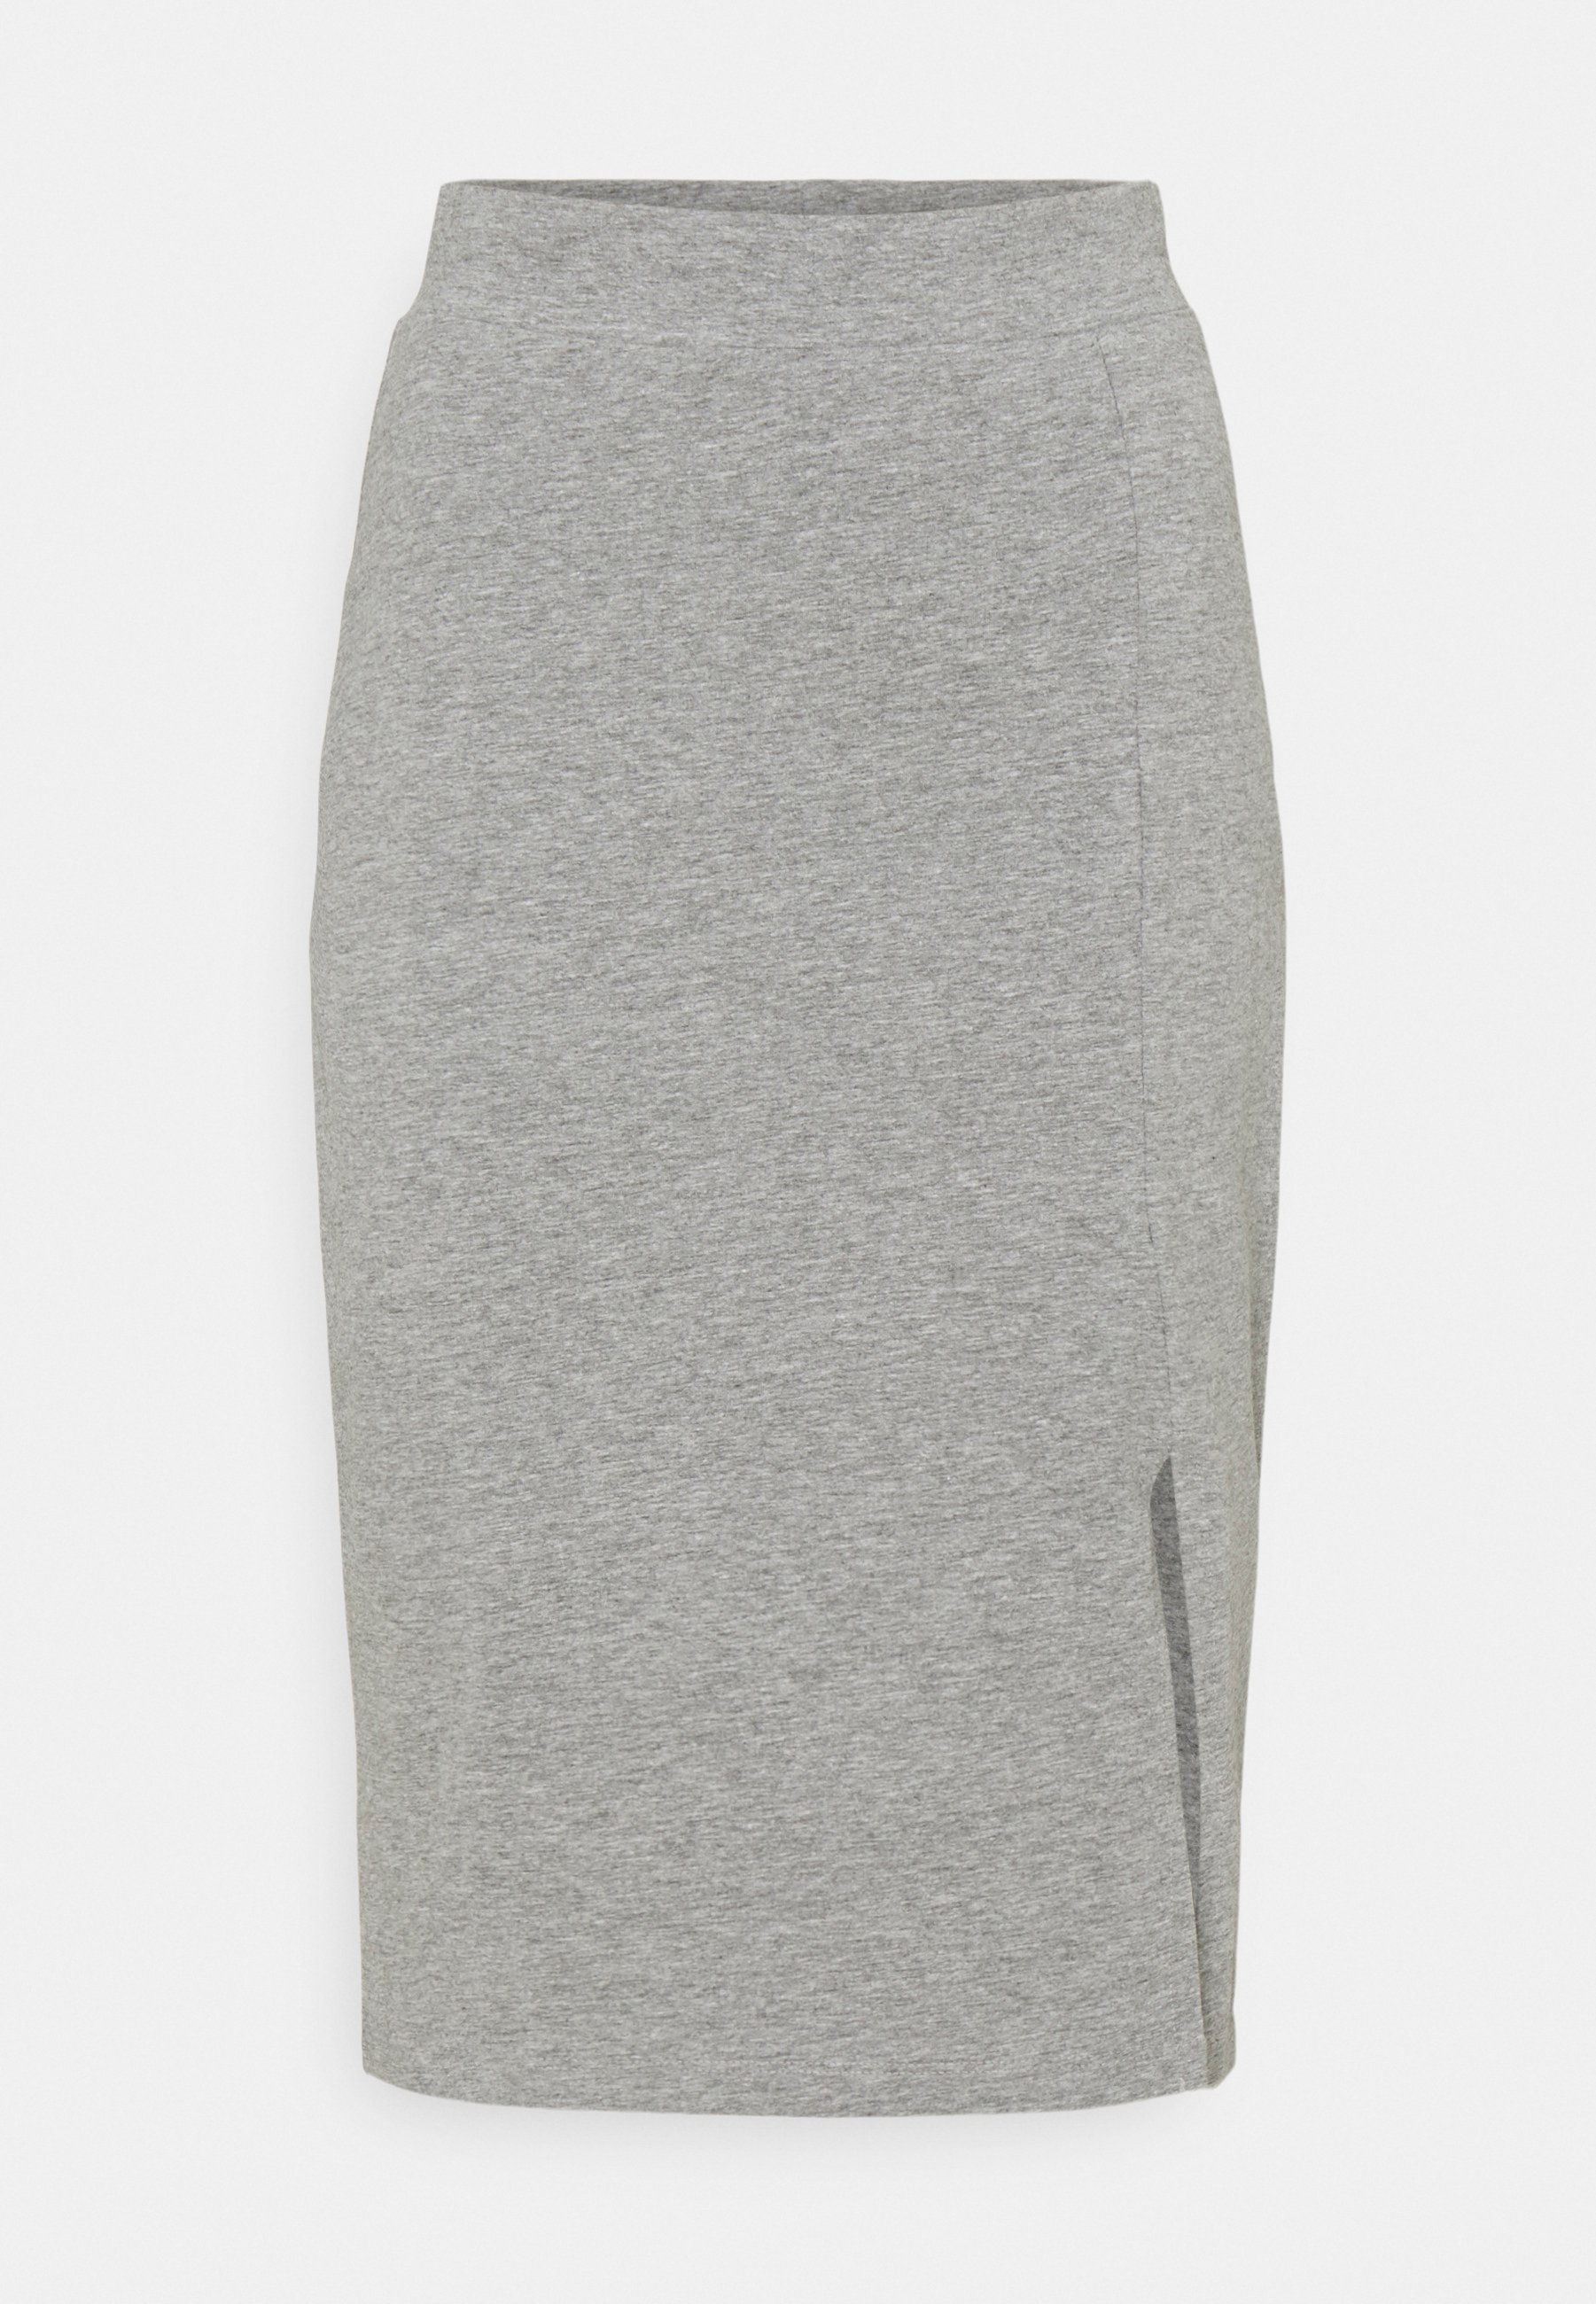 Femme BASIC - Midi skirt with slit - Jupe crayon